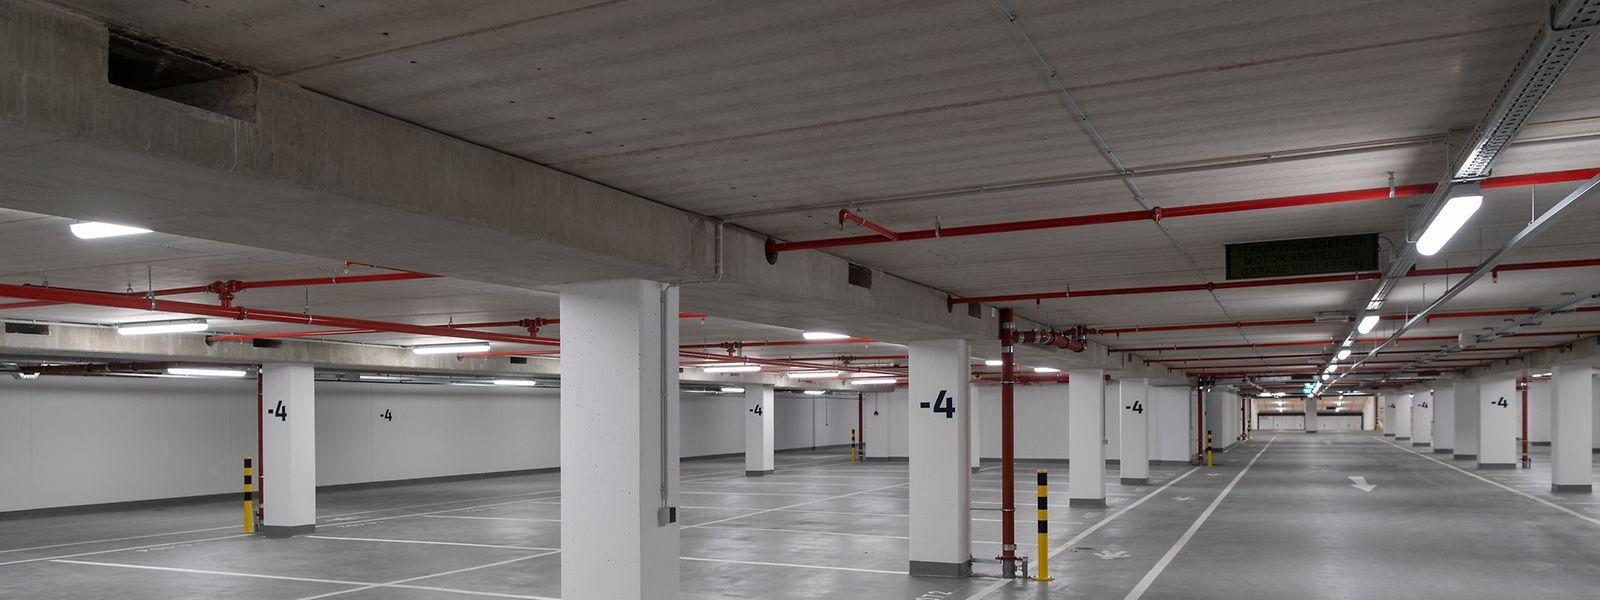 Un aperçu de ce nouveau parking tout neuf.